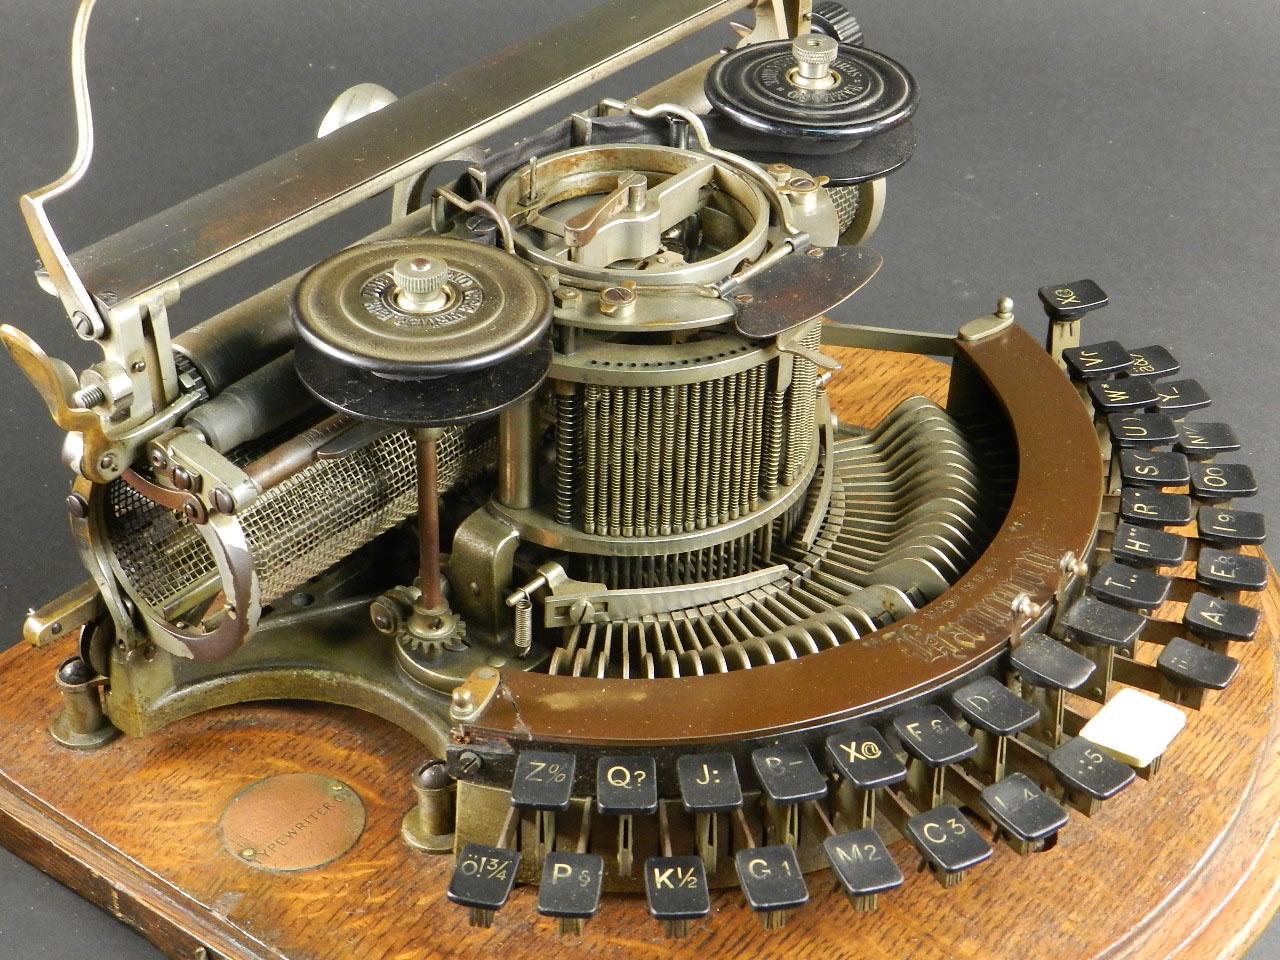 Imagen HAMMOND IDEAL AÑO 1890 26303